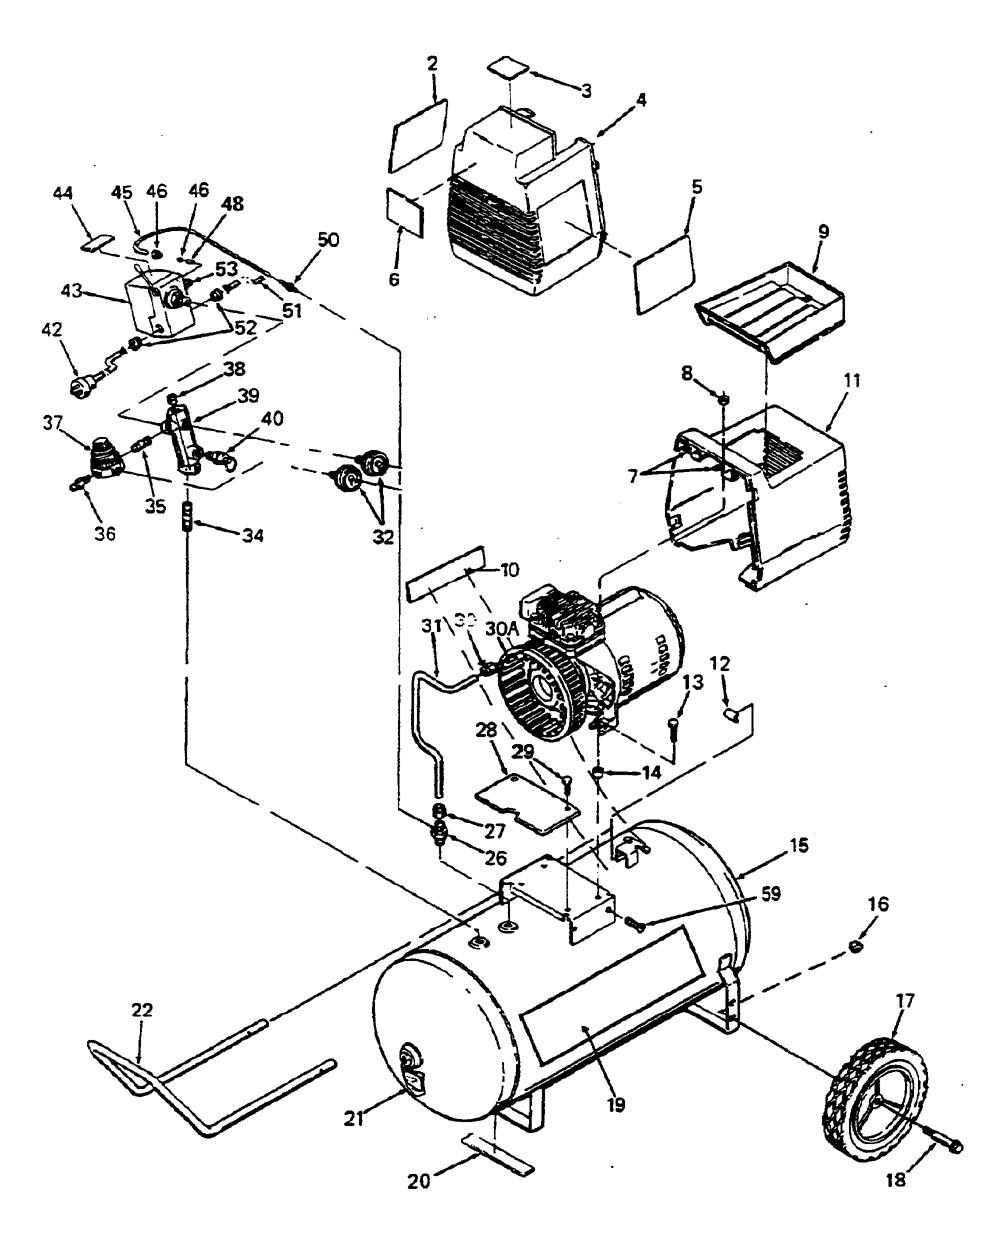 IRF312-Devilbiss-T3-PB-1Break Down